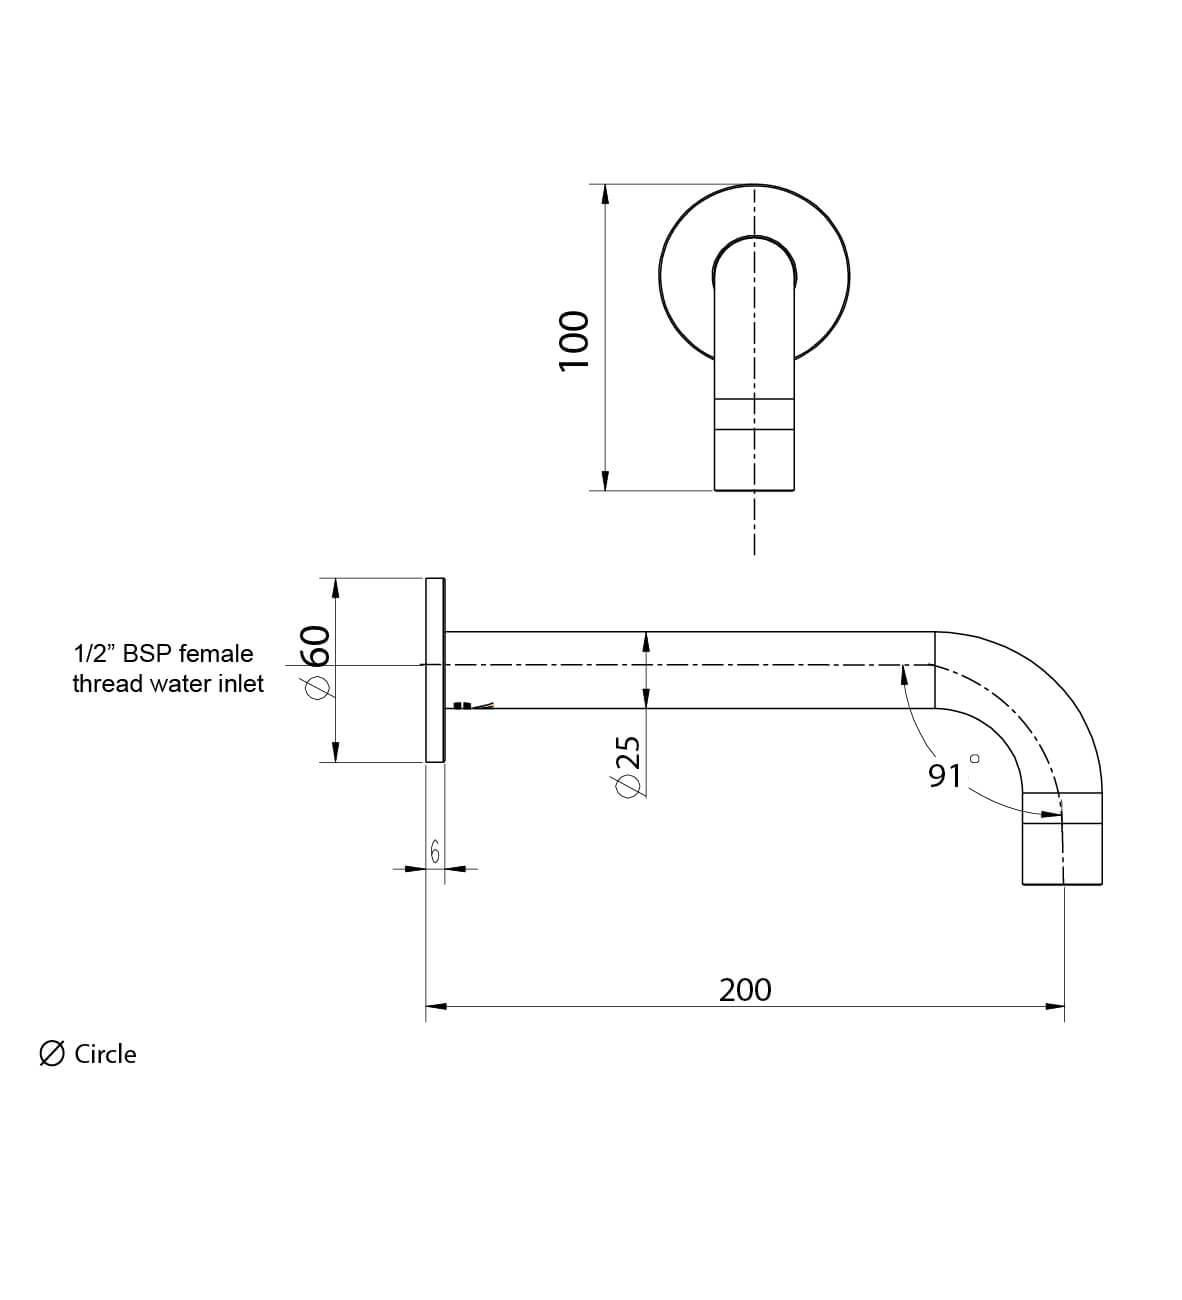 meir_MBS05-C_ROUND WALL BASIN SPOUT CHROME_Stiles_Product_tech-01